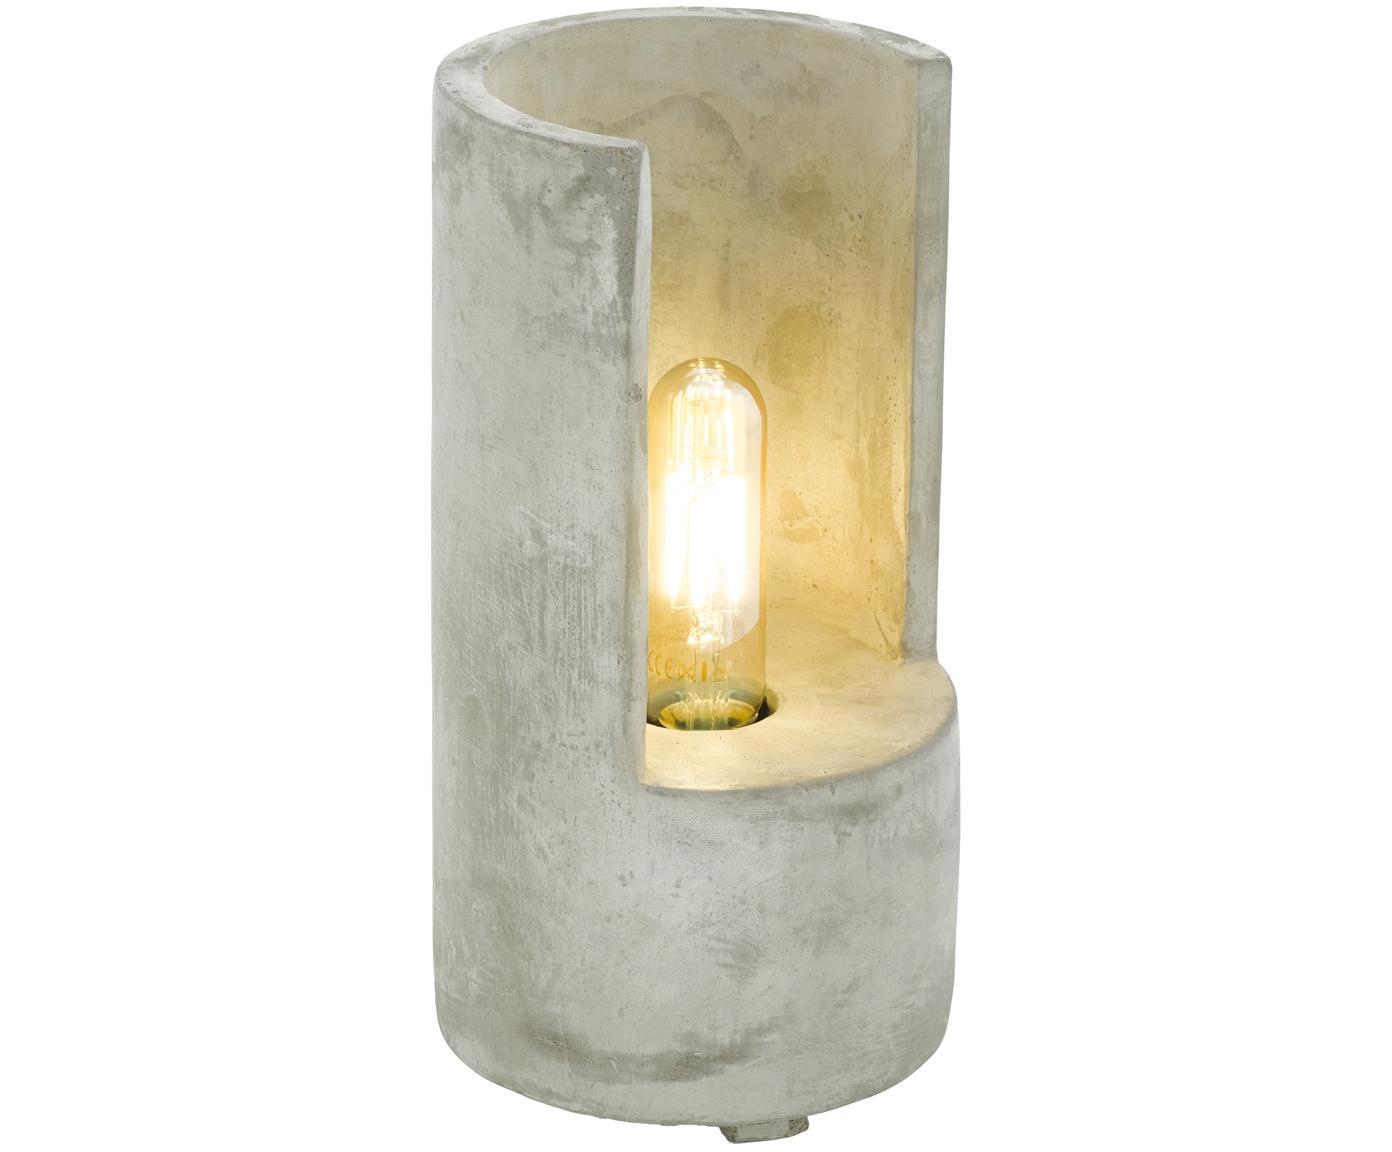 Lámpara de mesa de cemento Lynton, Lámpara: cemento, Cable: plástico, Gris cemento, Ø 14 x Al 27 cm